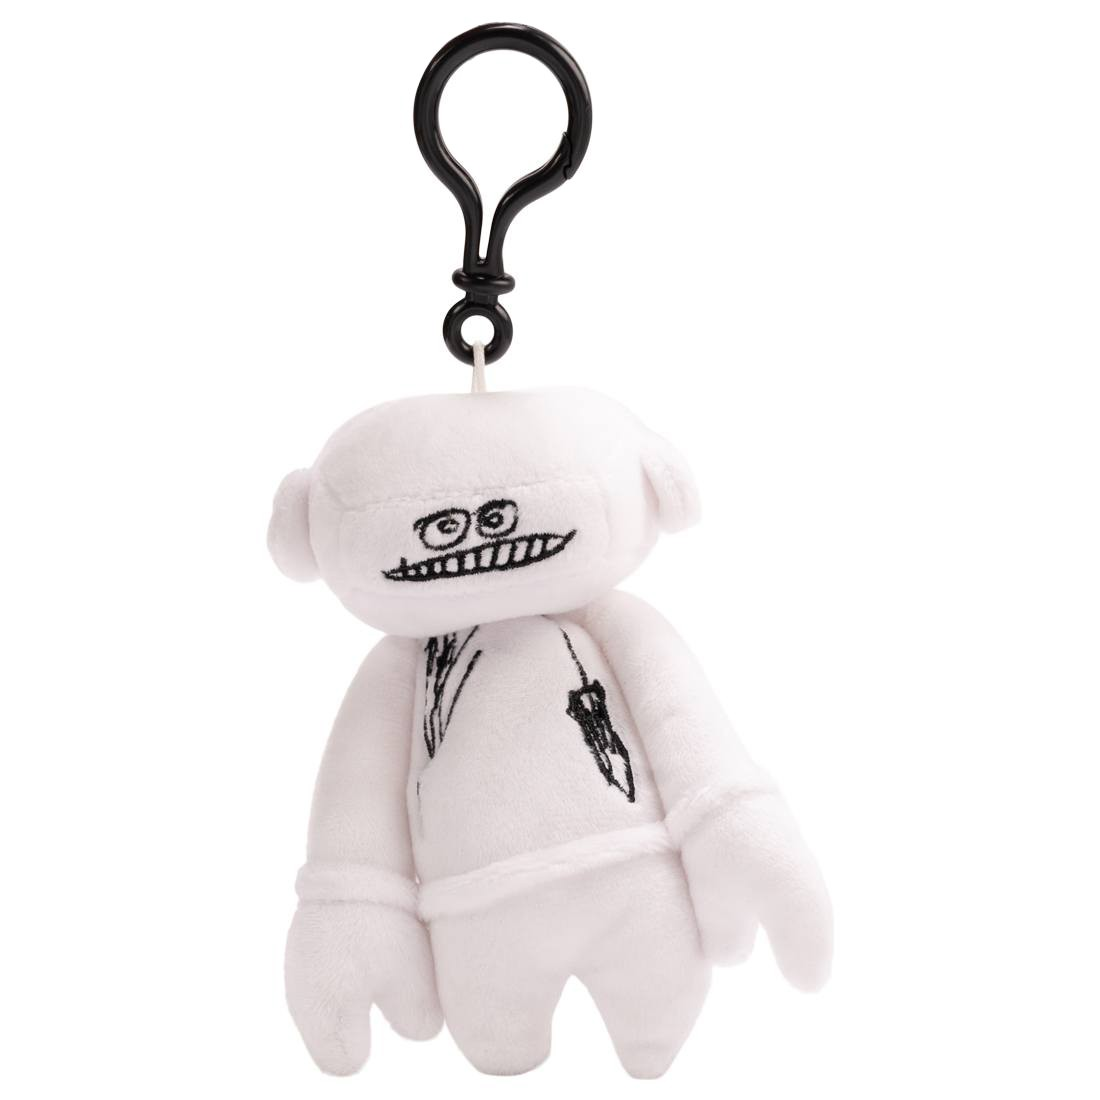 Futura Laboratories Johnny Plush Keychain (white)